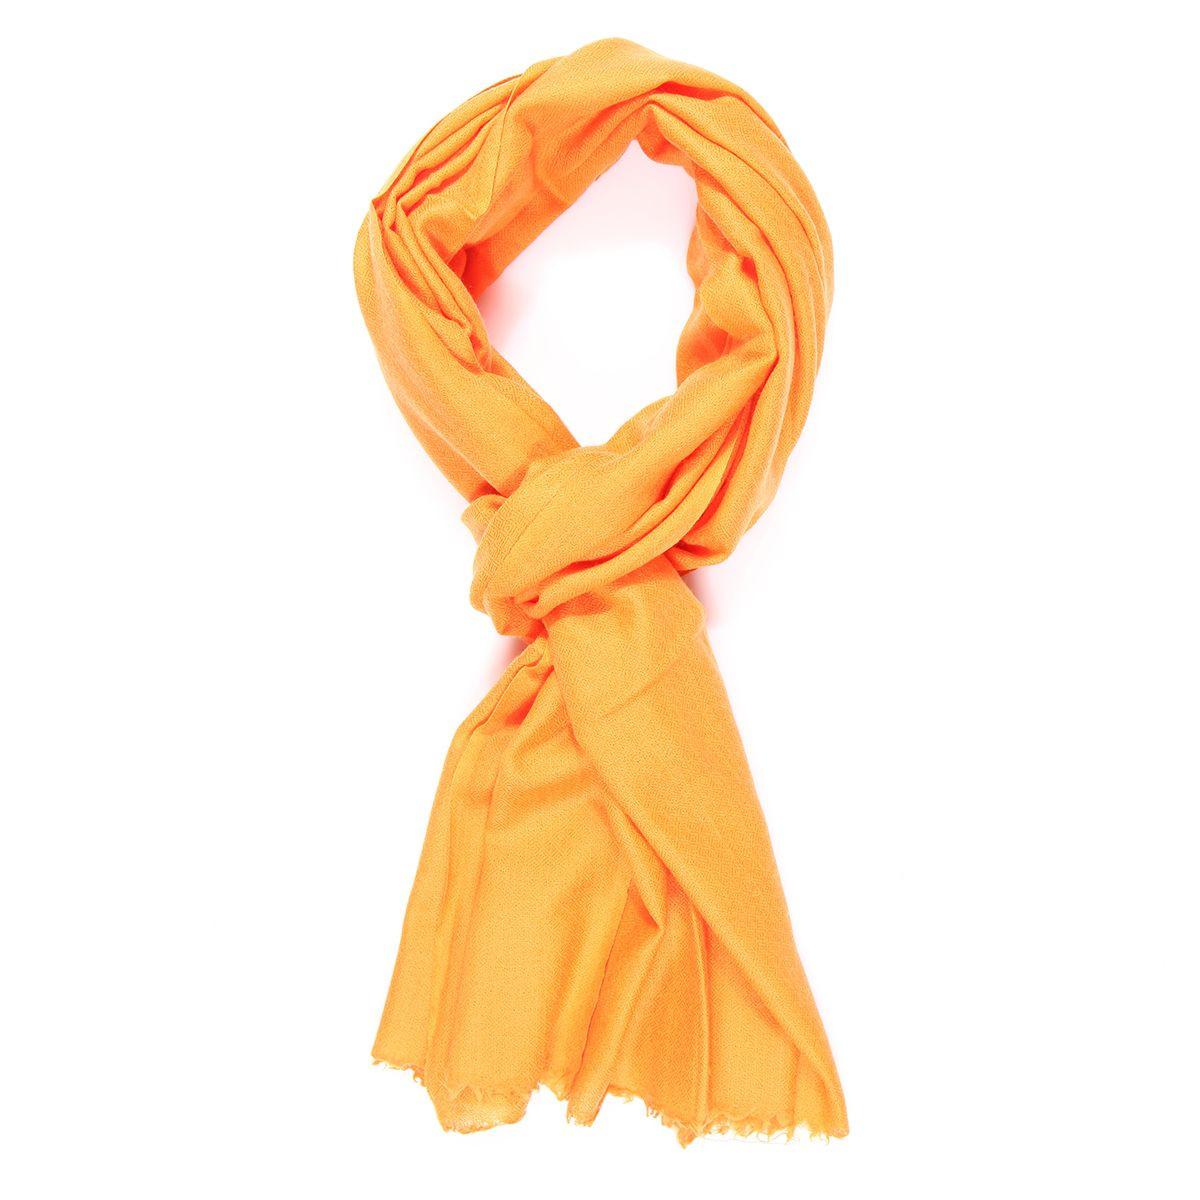 Echarpe cachemire orange pale - Surate - Le Comptoir de Simba